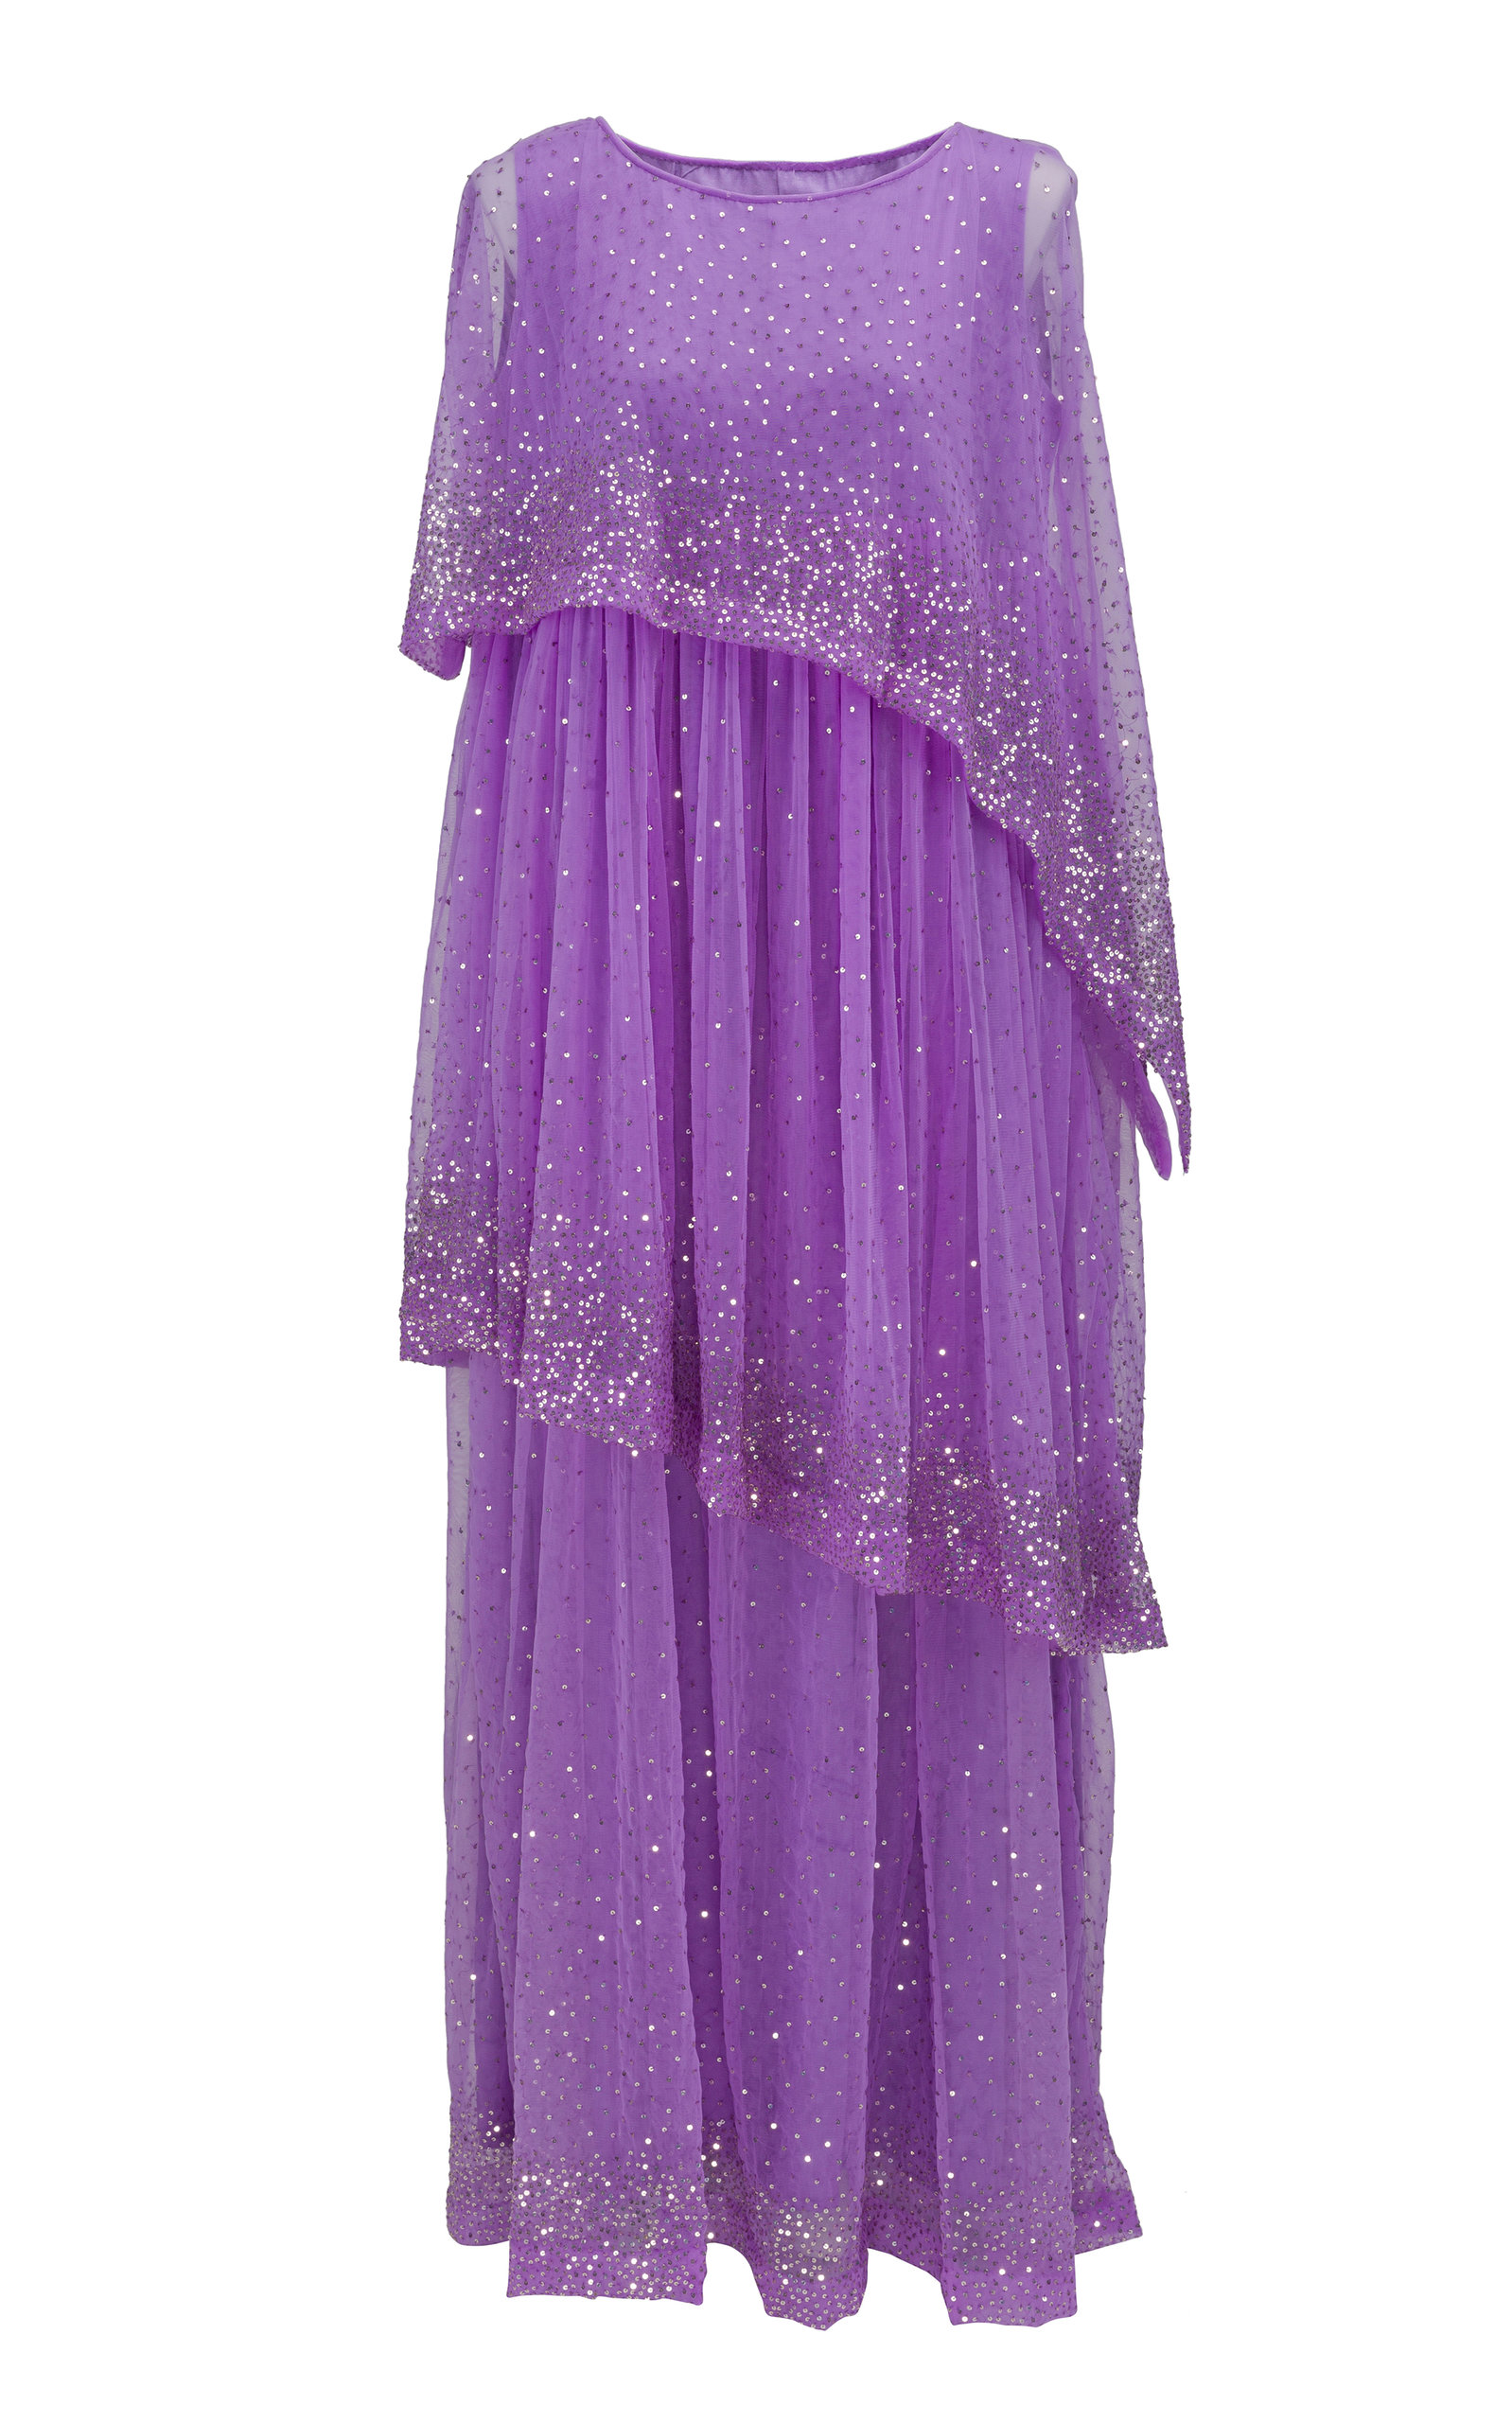 BTHAINA Tiered Embellished Chiffon Kaftan in Purple